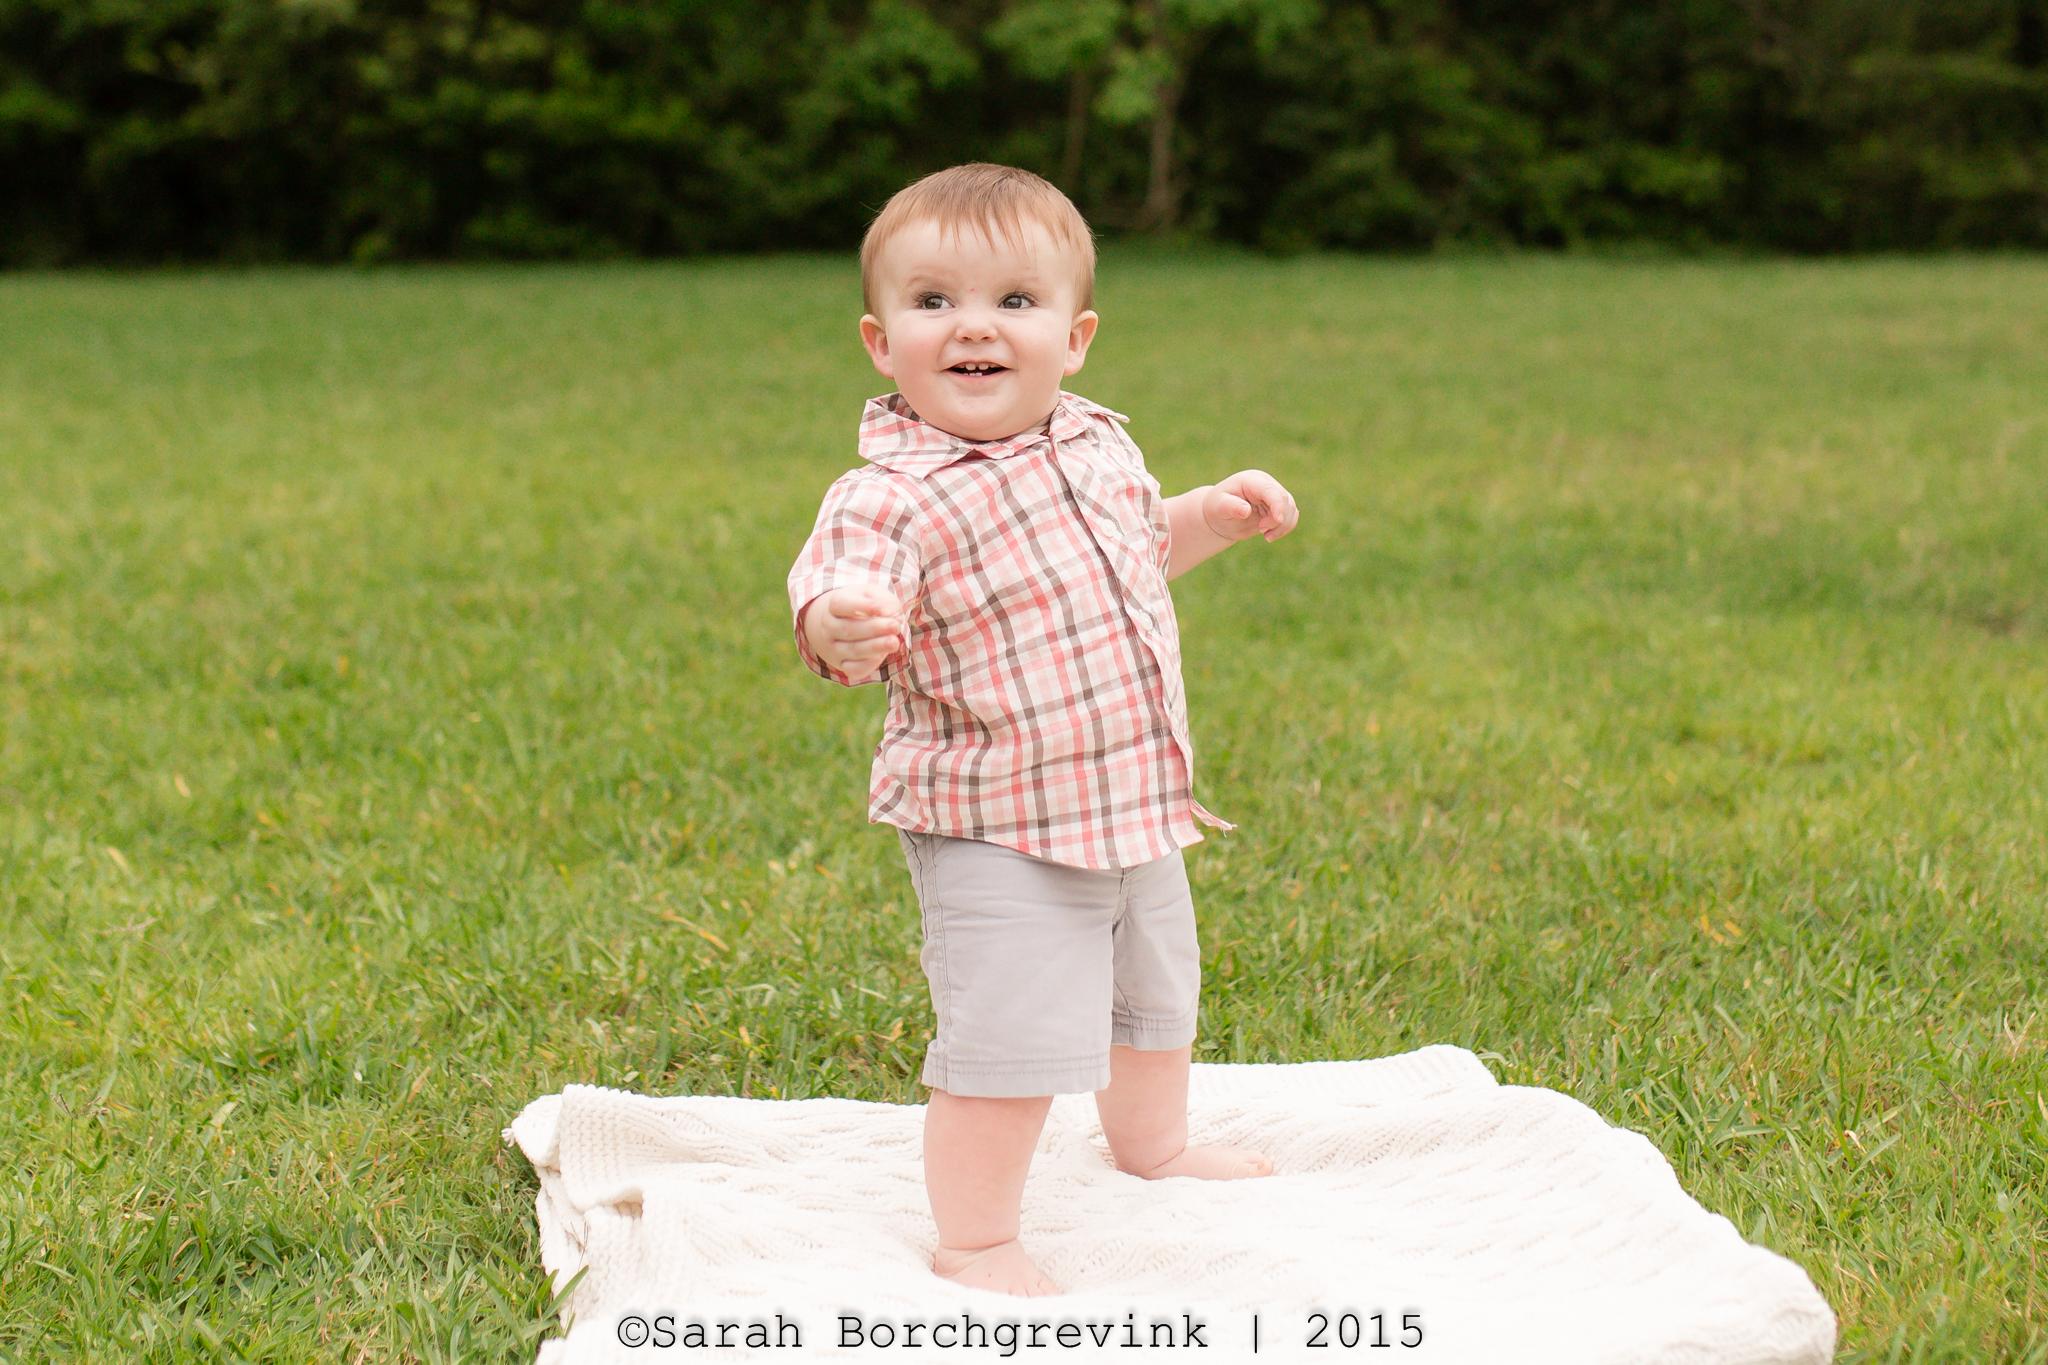 houston child and family photographer